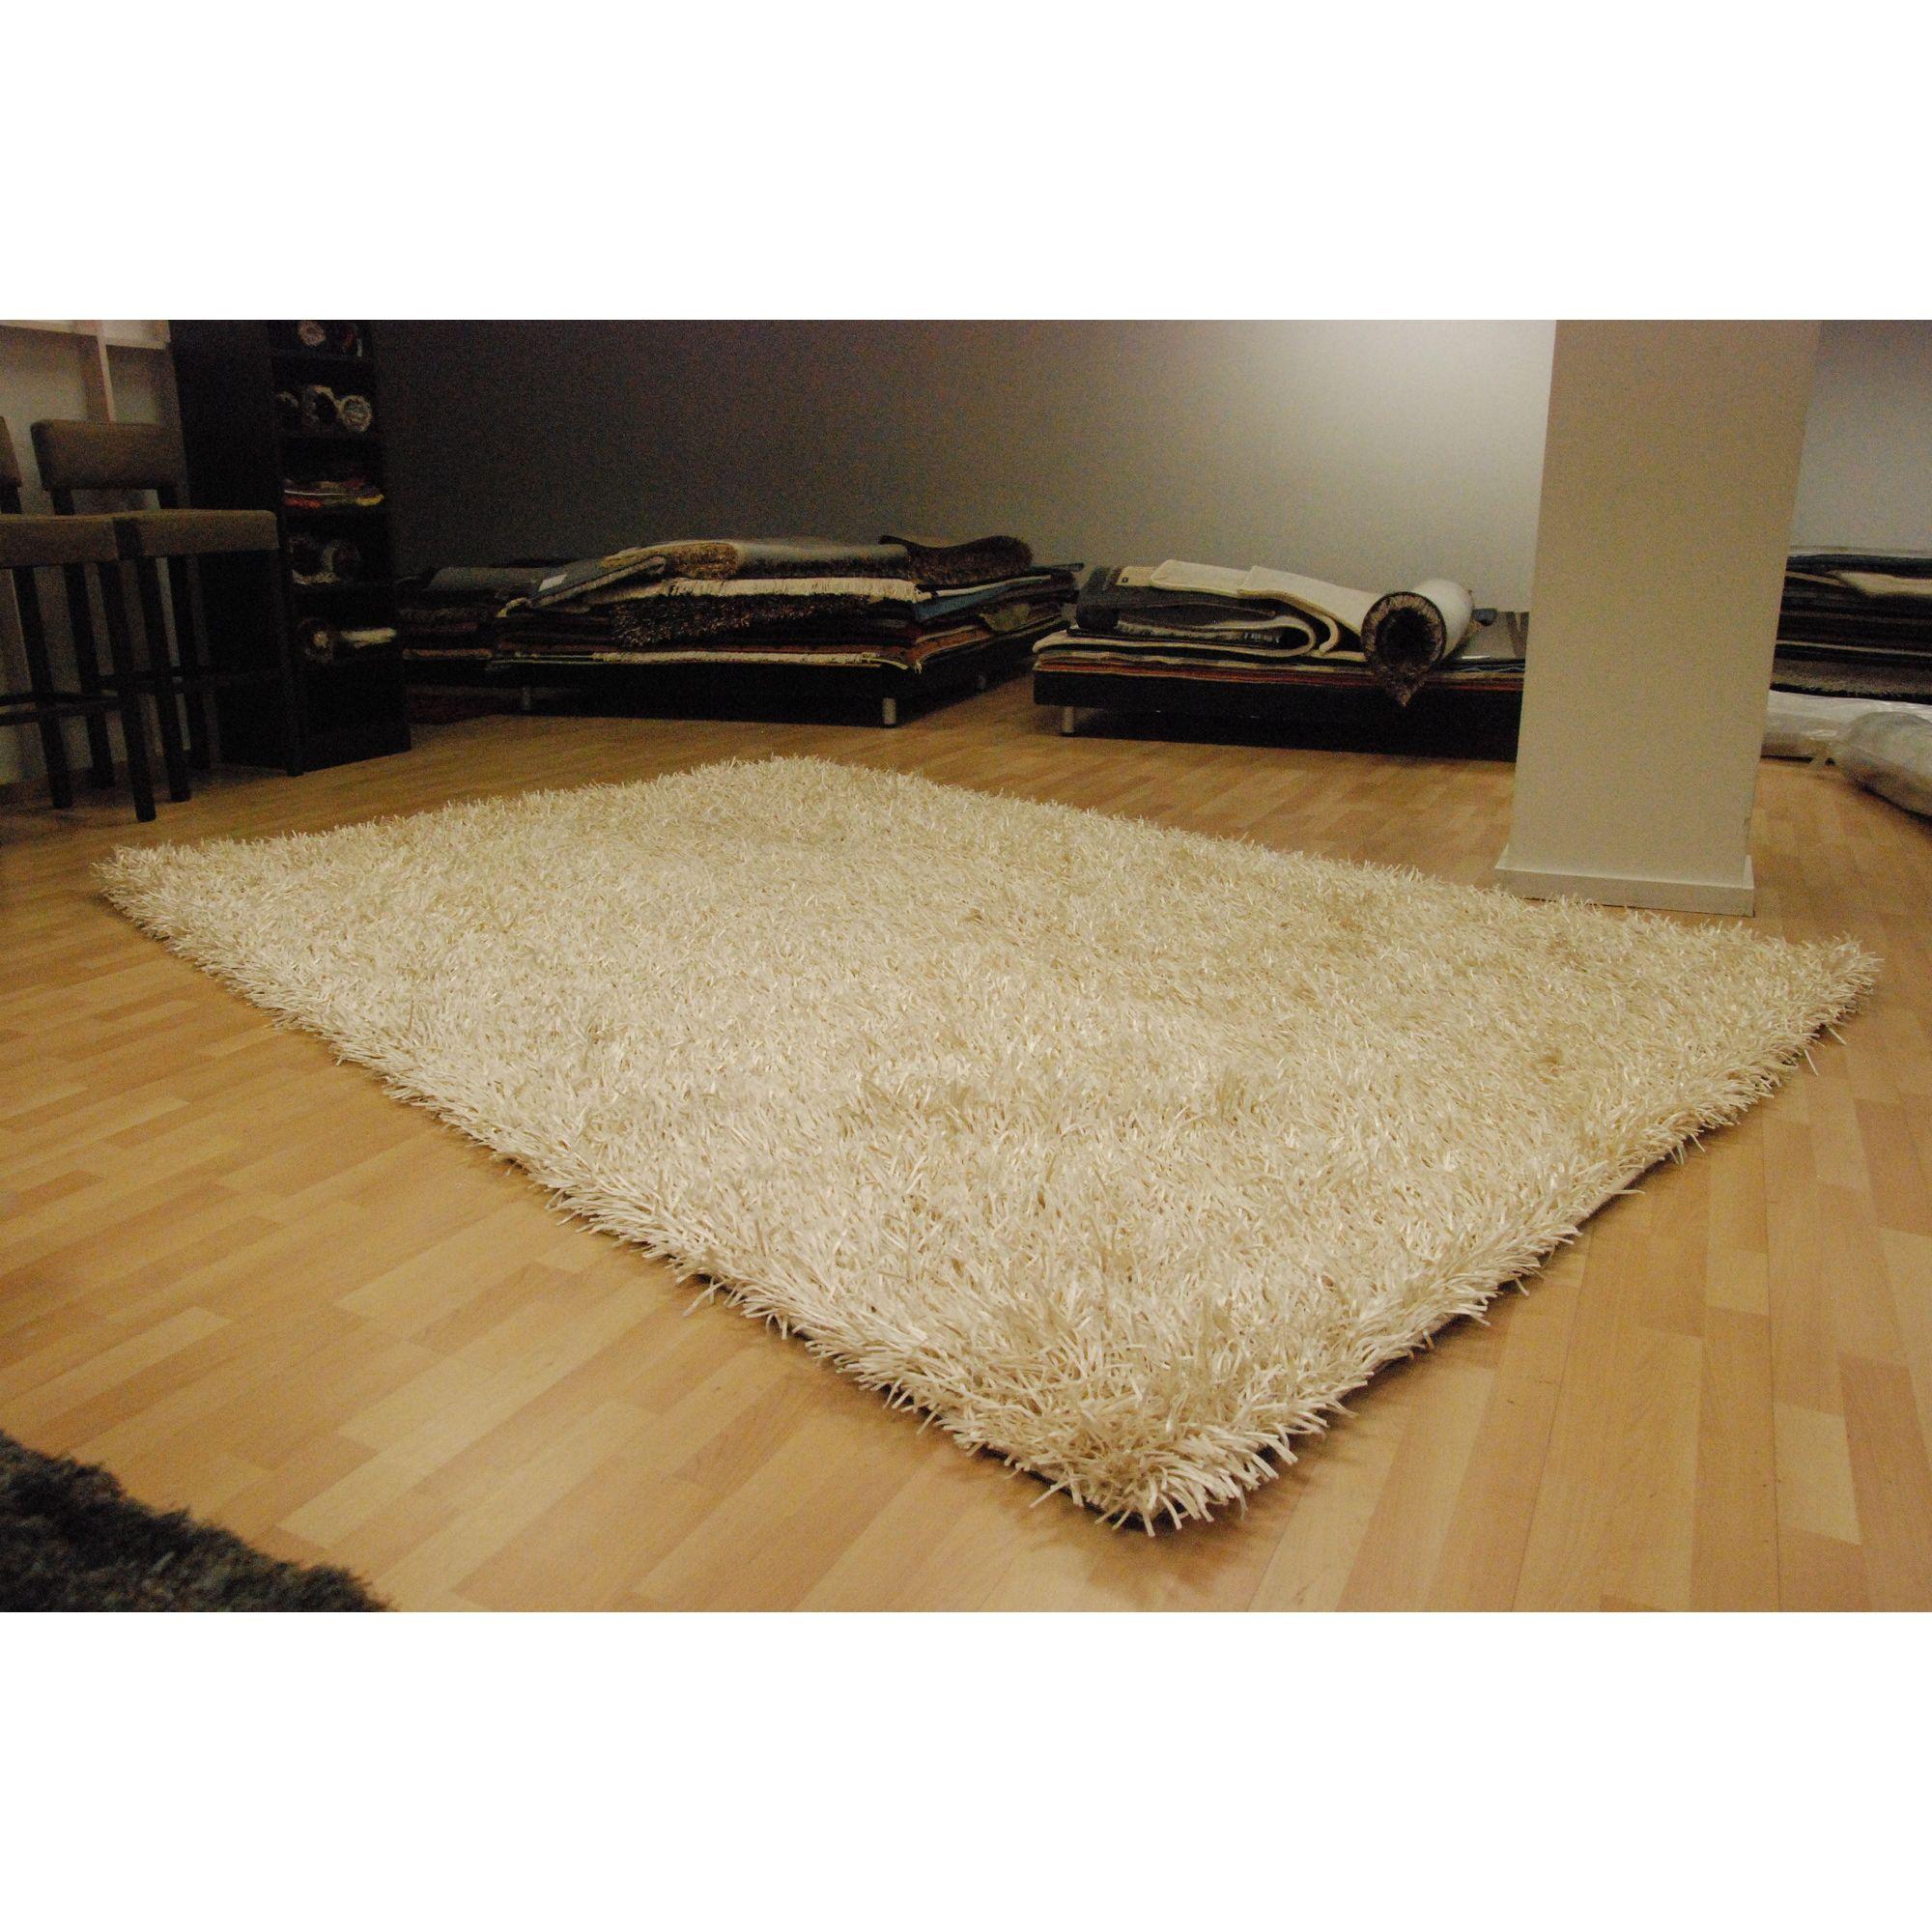 Angelo Capri White Knotted Rug - 300cm x 200cm (9 ft 10 in x 6 ft 6.5 in)